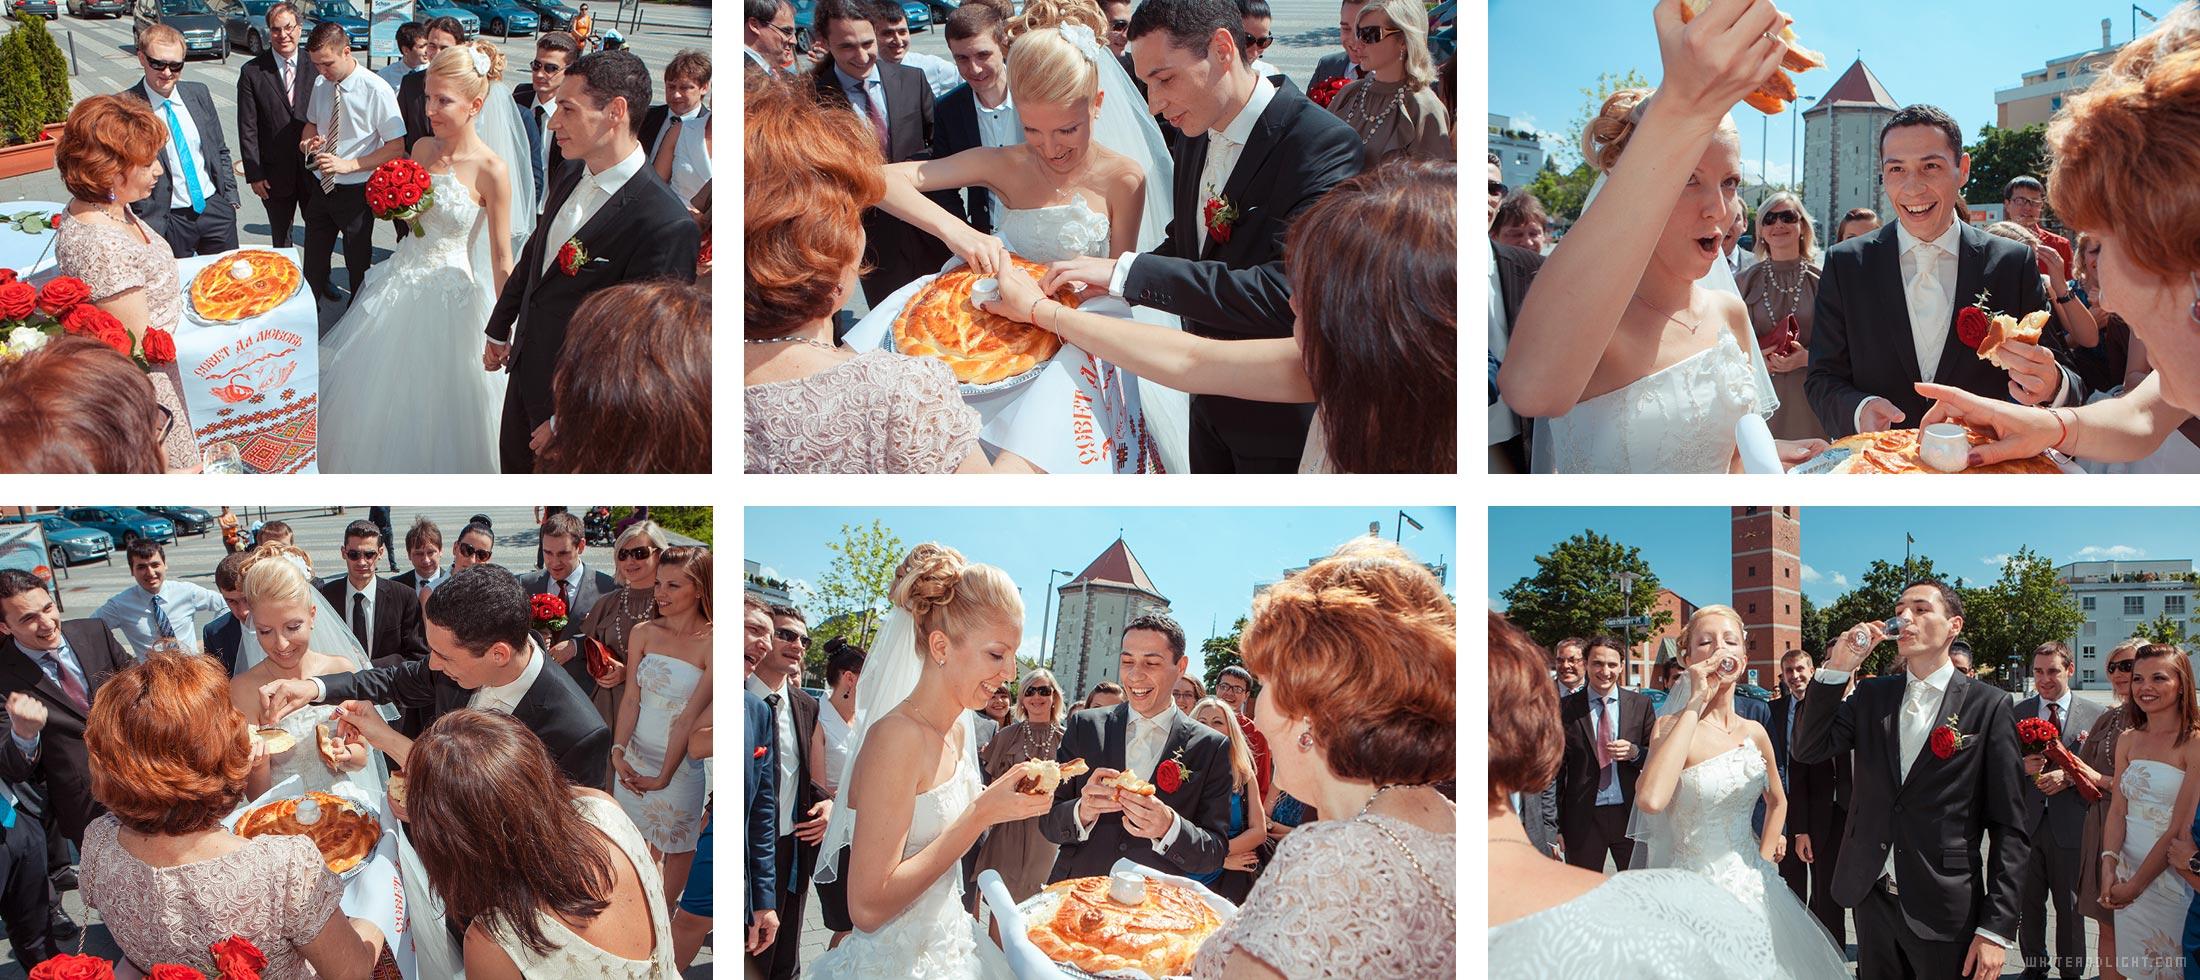 Wedding photographer Blog - weddingannouncements